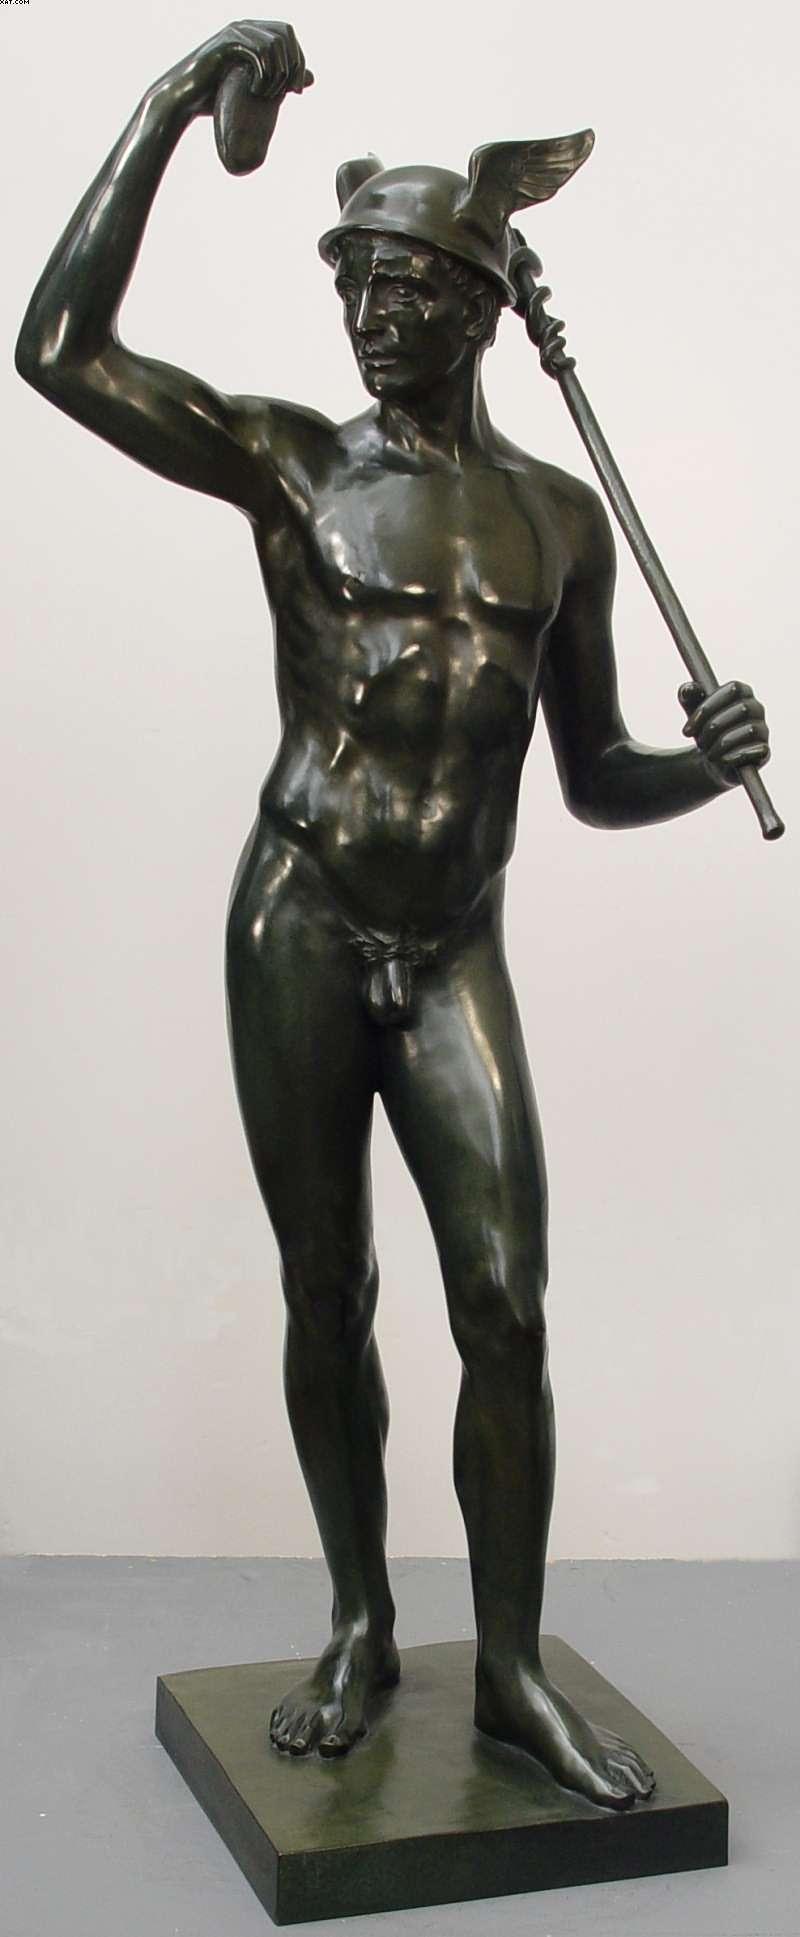 Mercury God Statue - Viewing Gallery Mercury